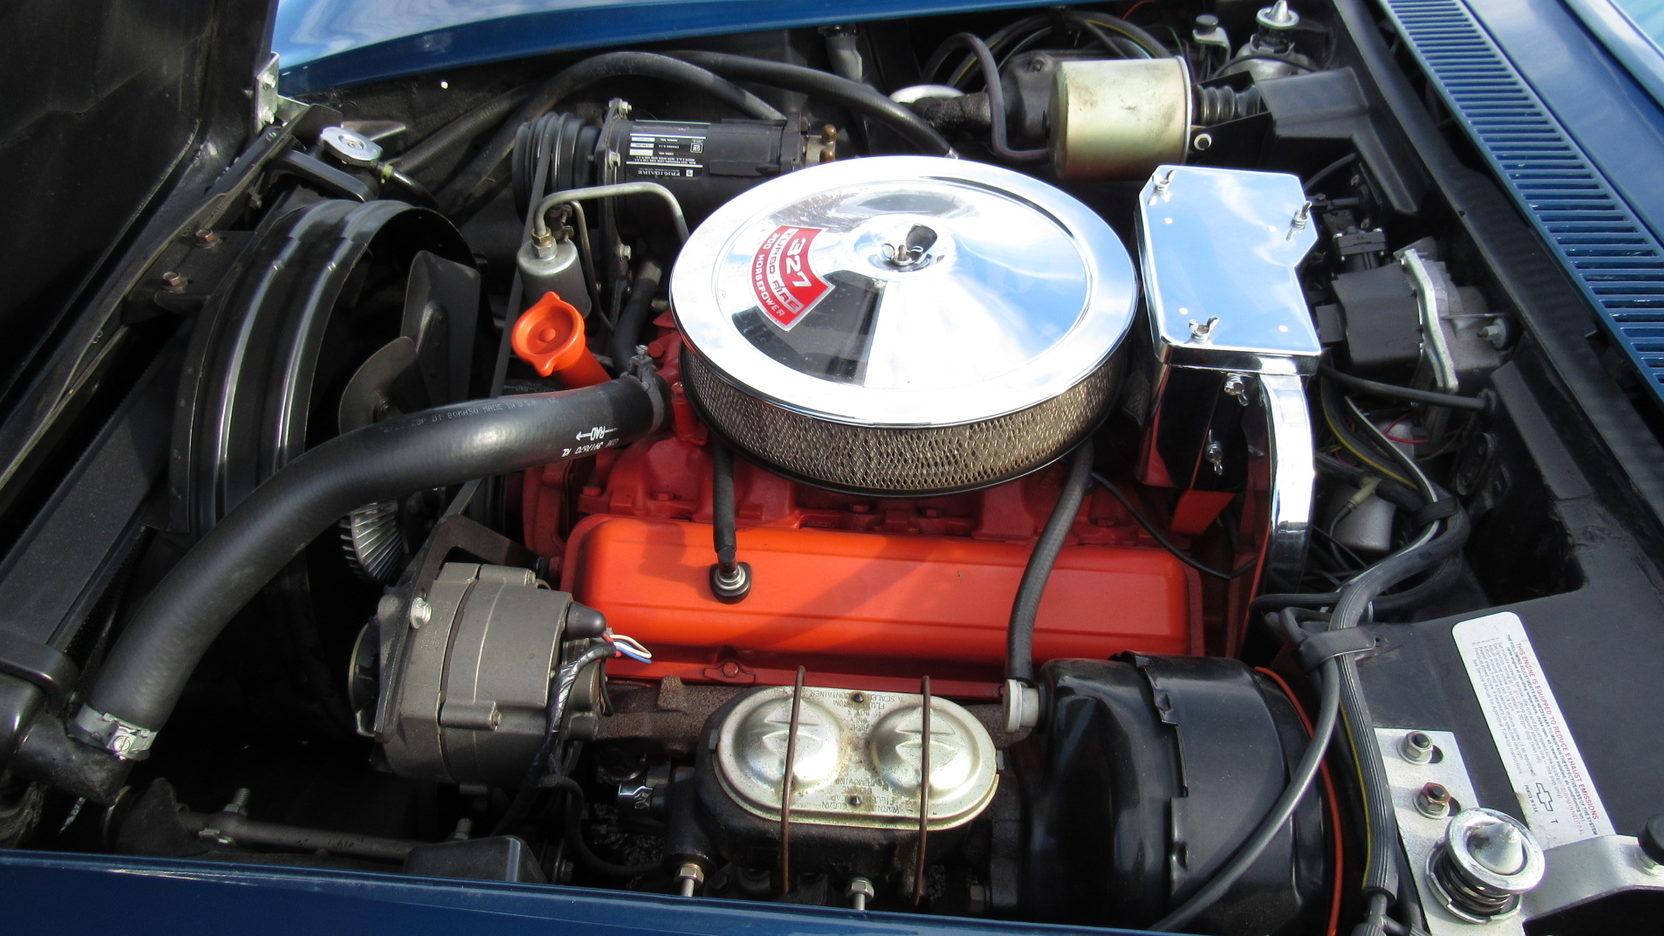 1968 327 Chevy Engine Diagram - Vtwctr   Chevy 327 Engine Diagram      vtwctr.org